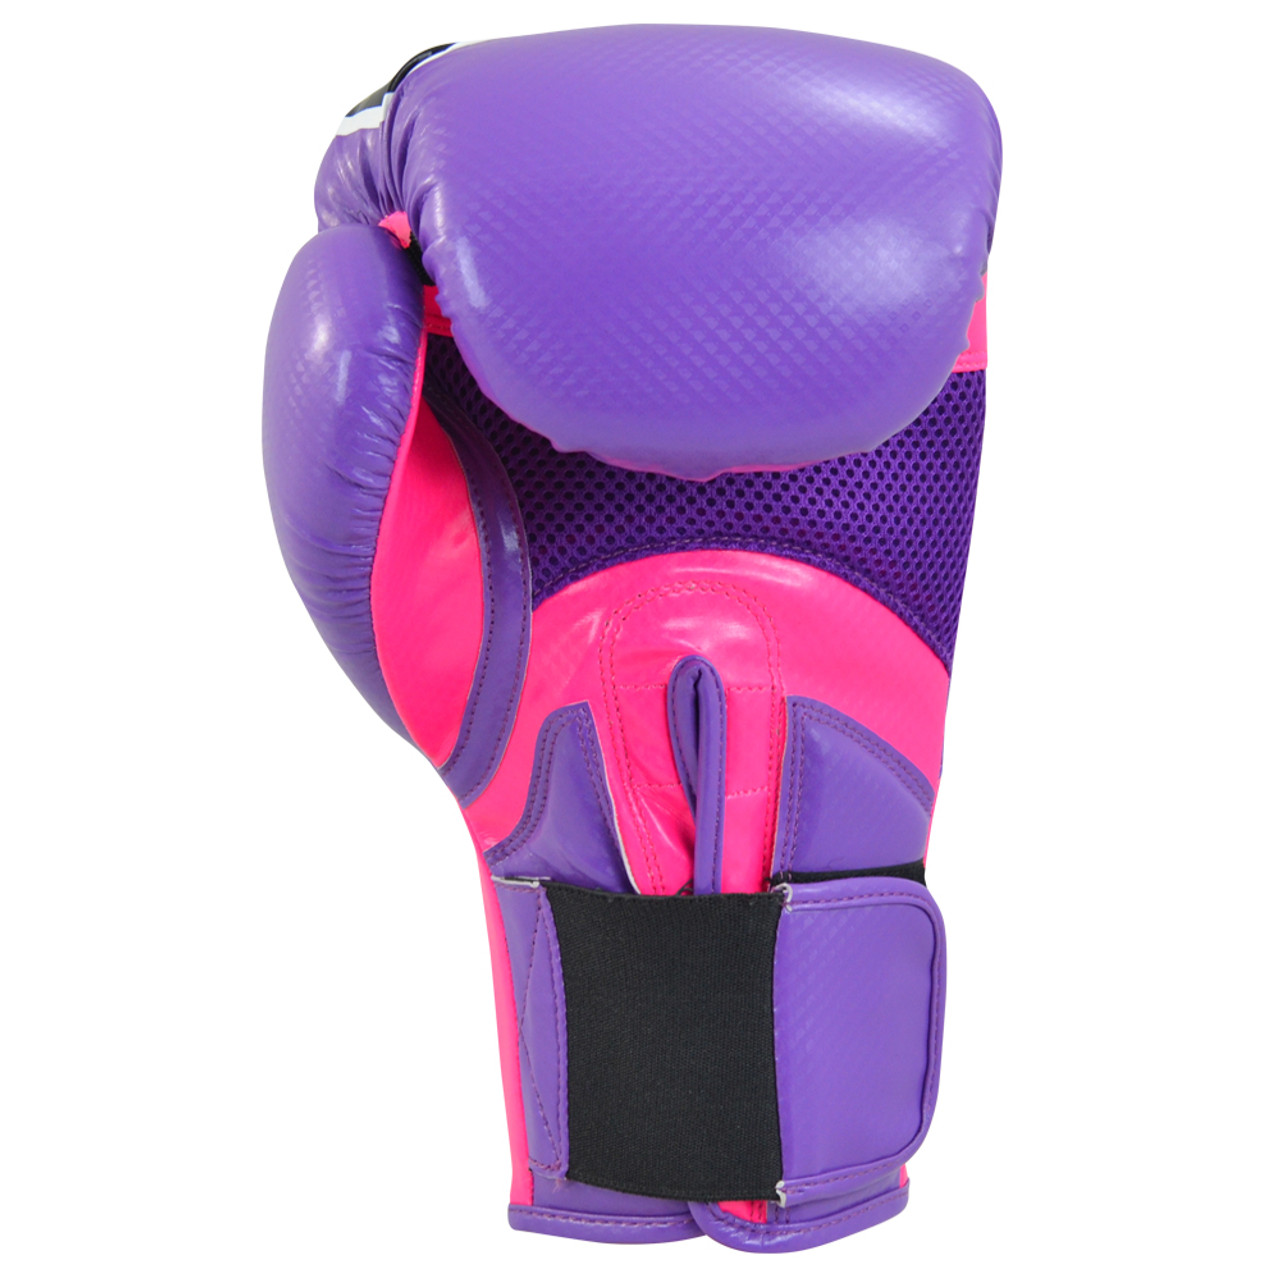 CR Turbo Pink & Purple Boxing Gloves - Combat Corner